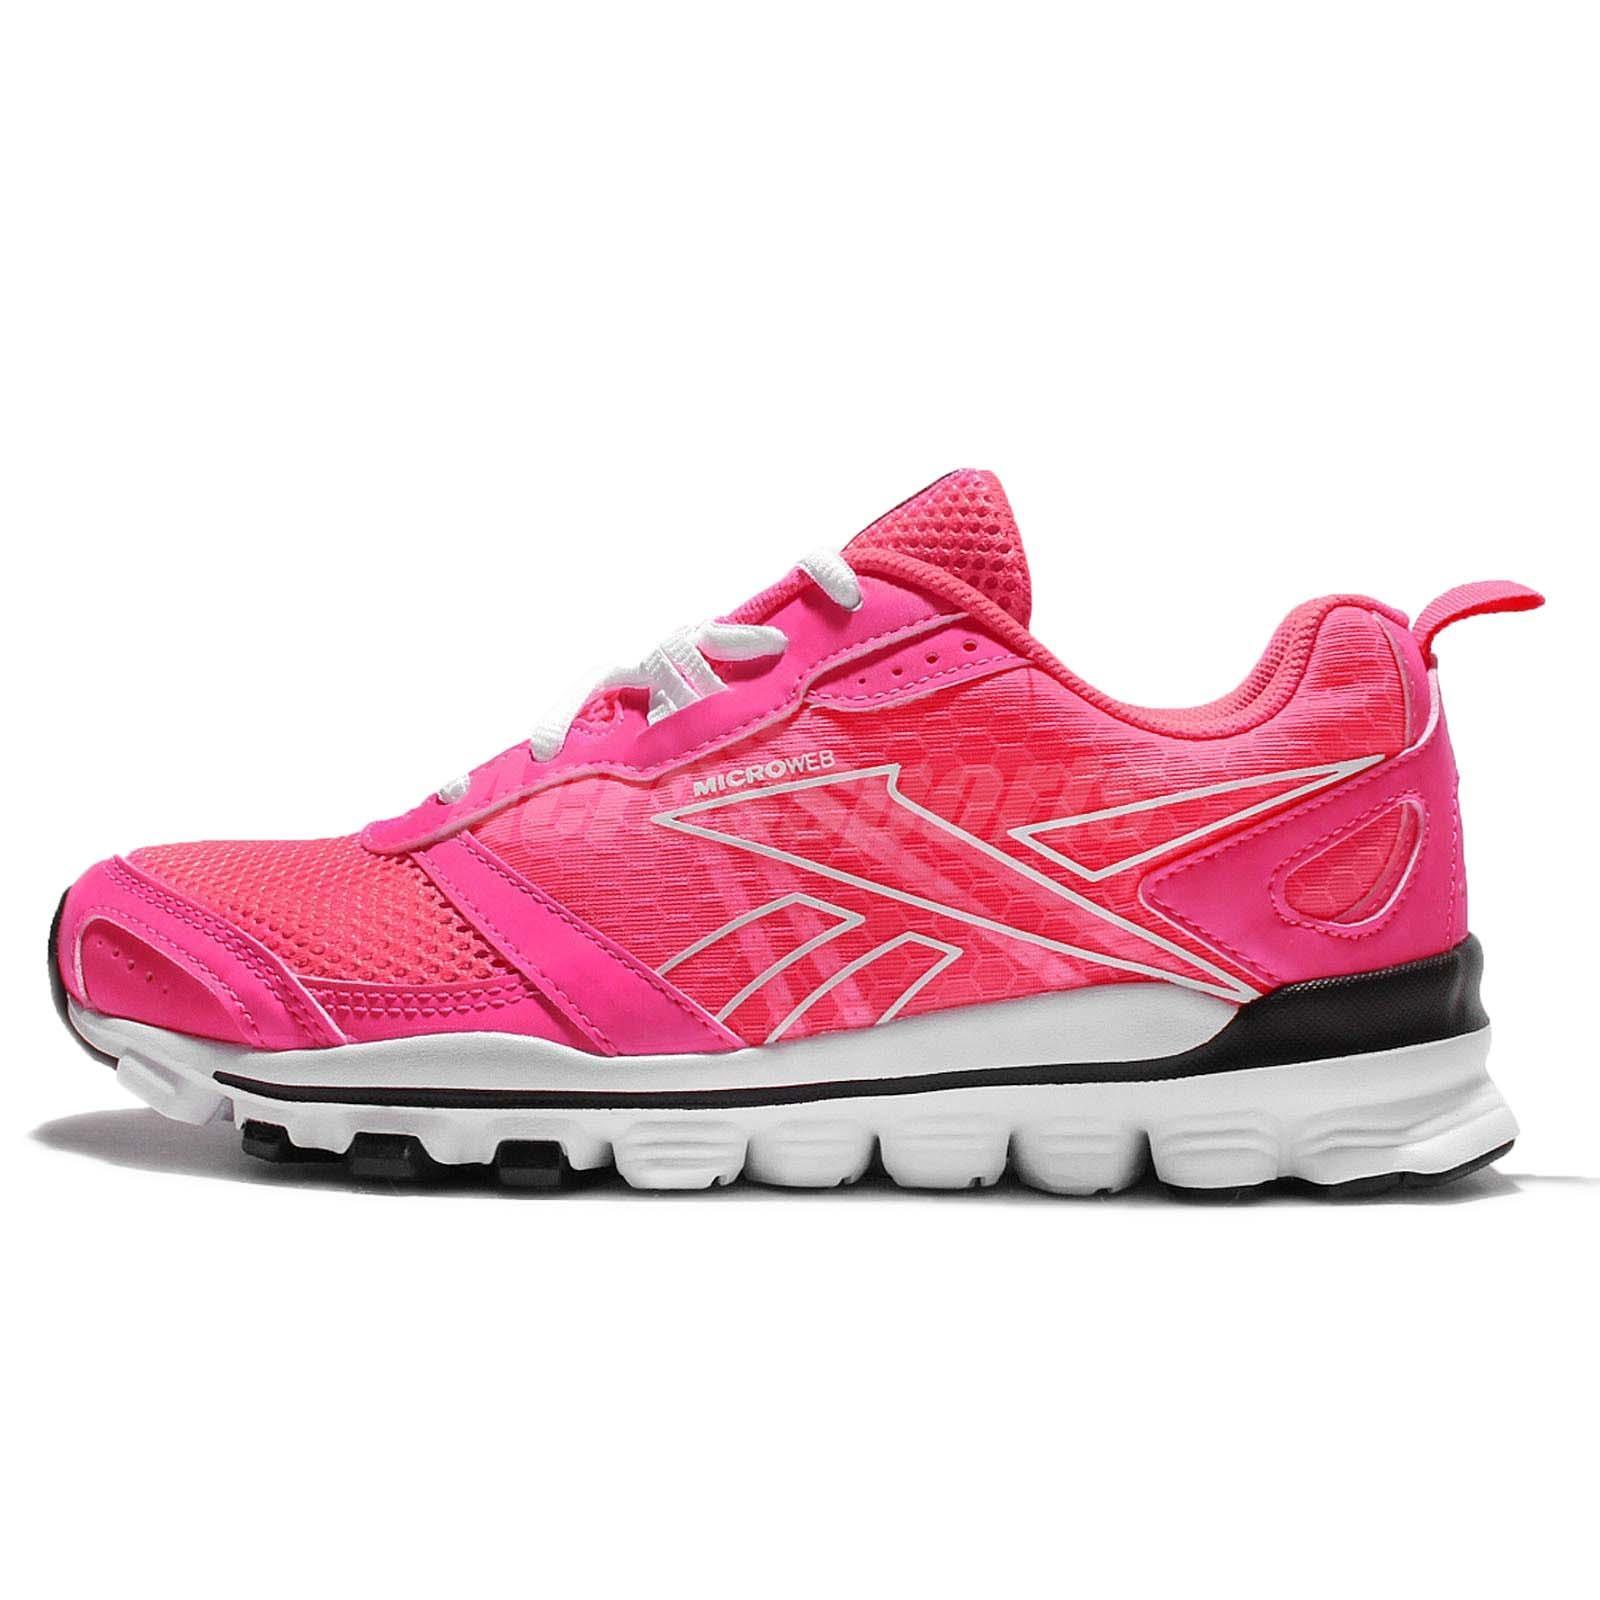 Reebok Hexaffect Run LE Pink White Women Running Shoes Sneakers AQ9354 89db4870a